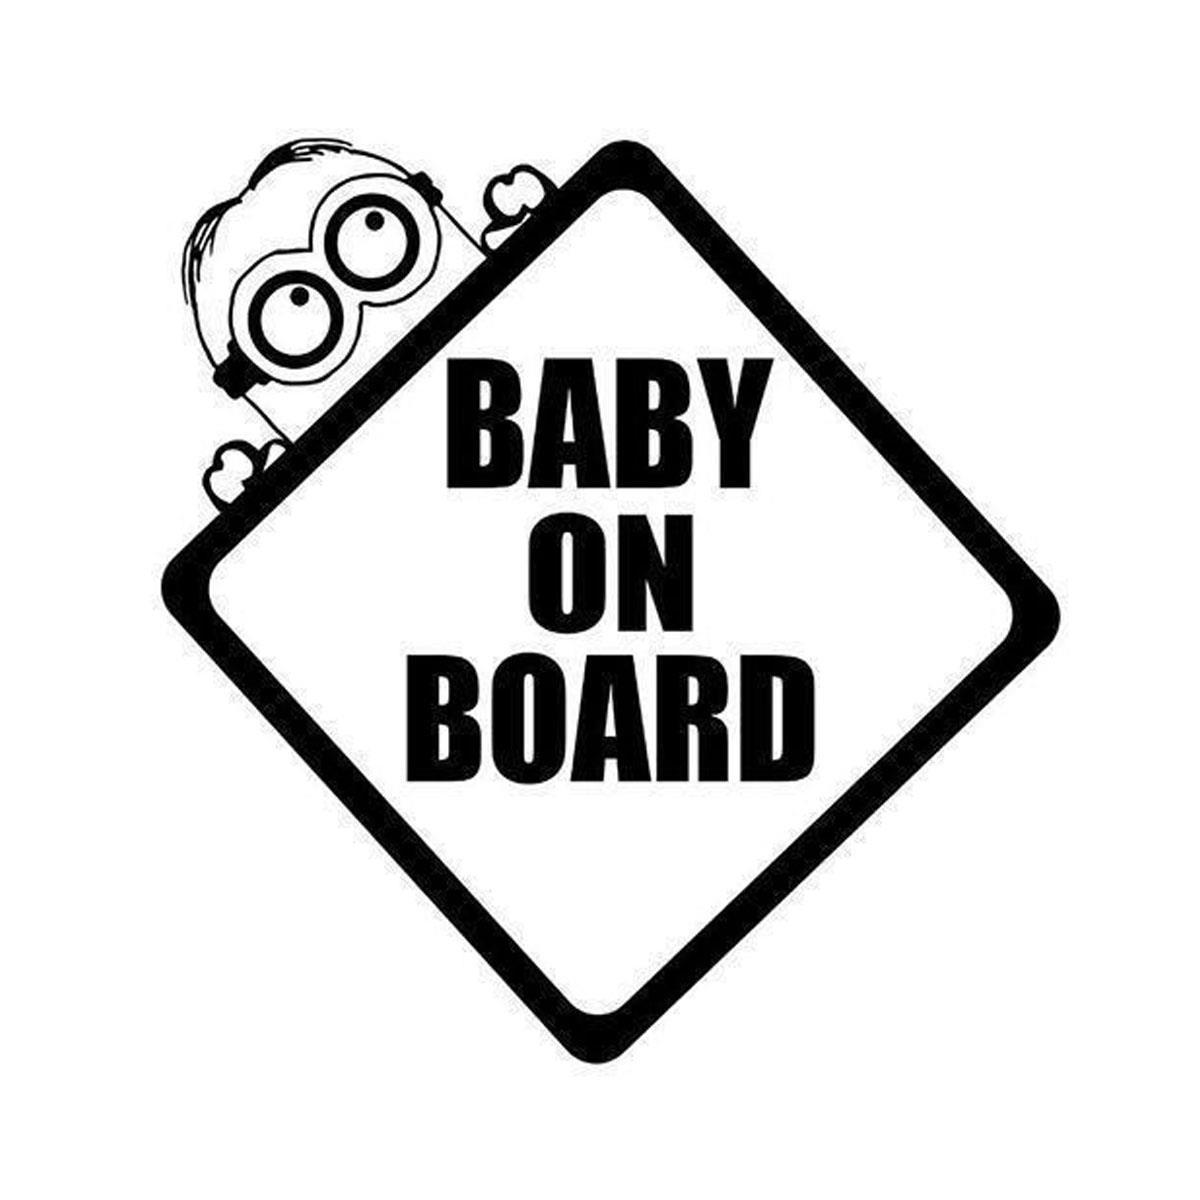 Car body sticker design eps - Baby On Board Minion Sticker Decal Vinyl Car Window Windscreen Wall Home Bedroom Children Refrigerator Bumper